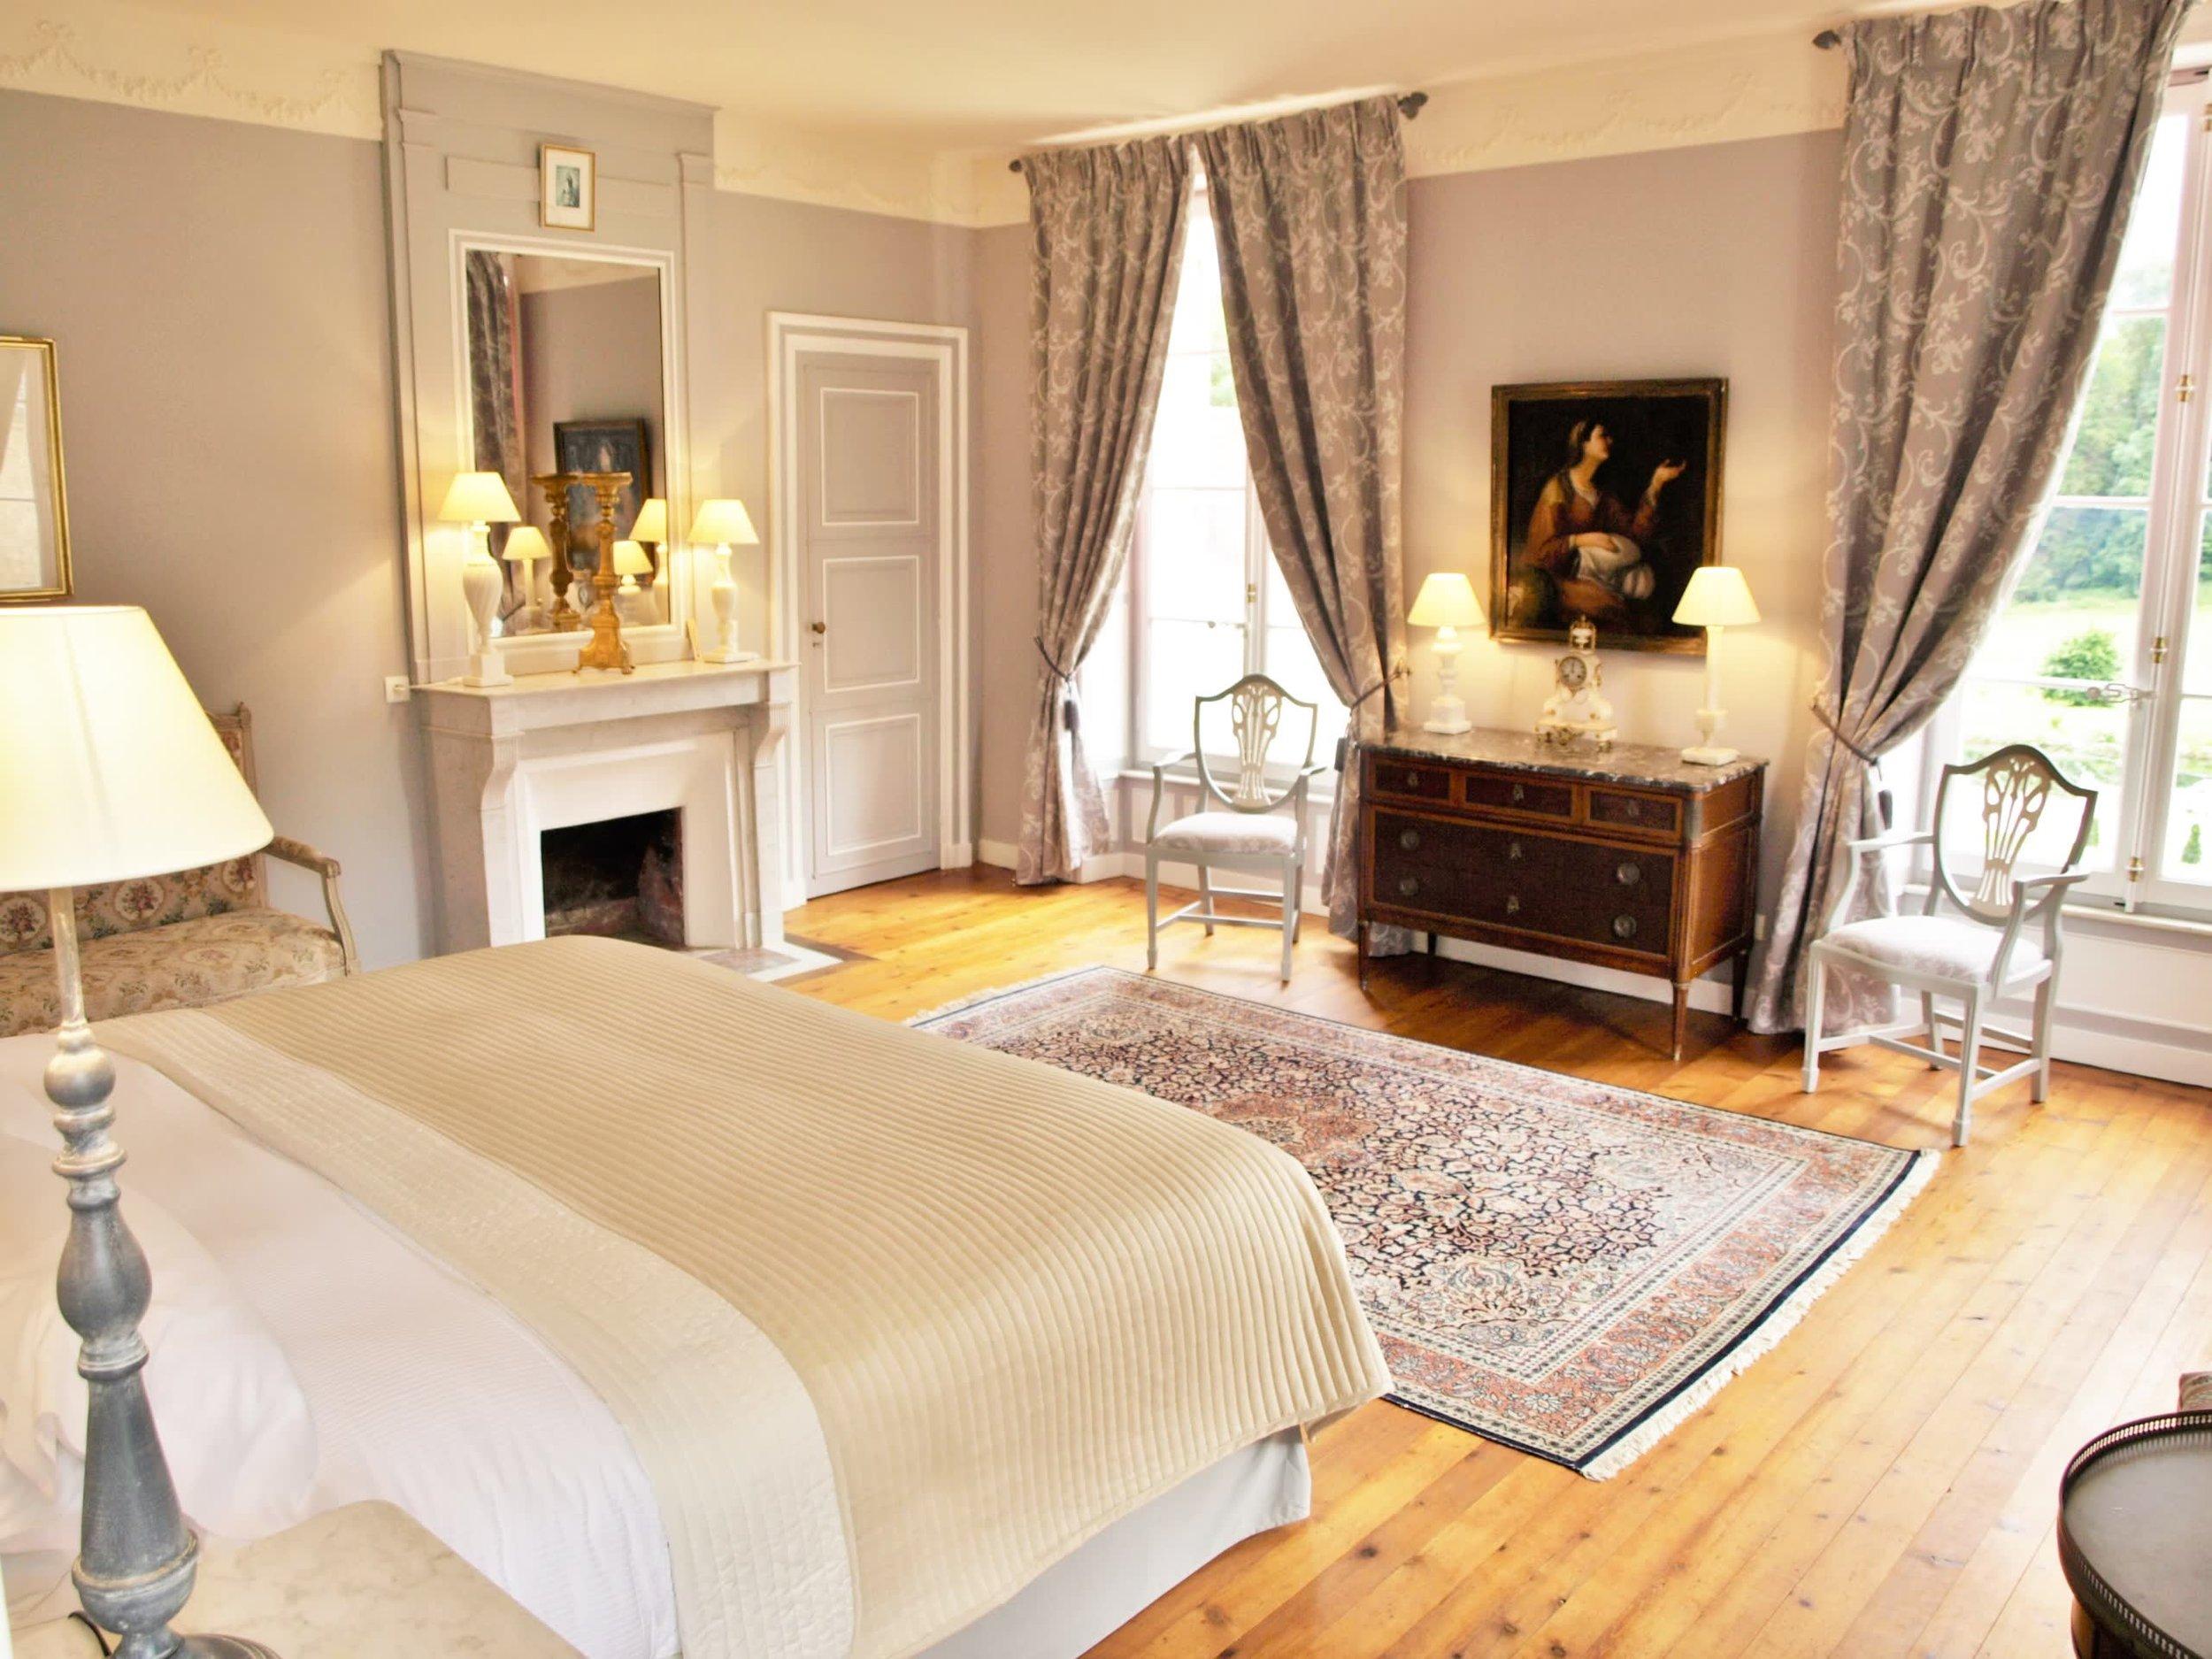 Chateau de la Pommeraye - charming boutique hotel chateau b&b spa normandy calvados bedroom Rubans 6(2).jpg